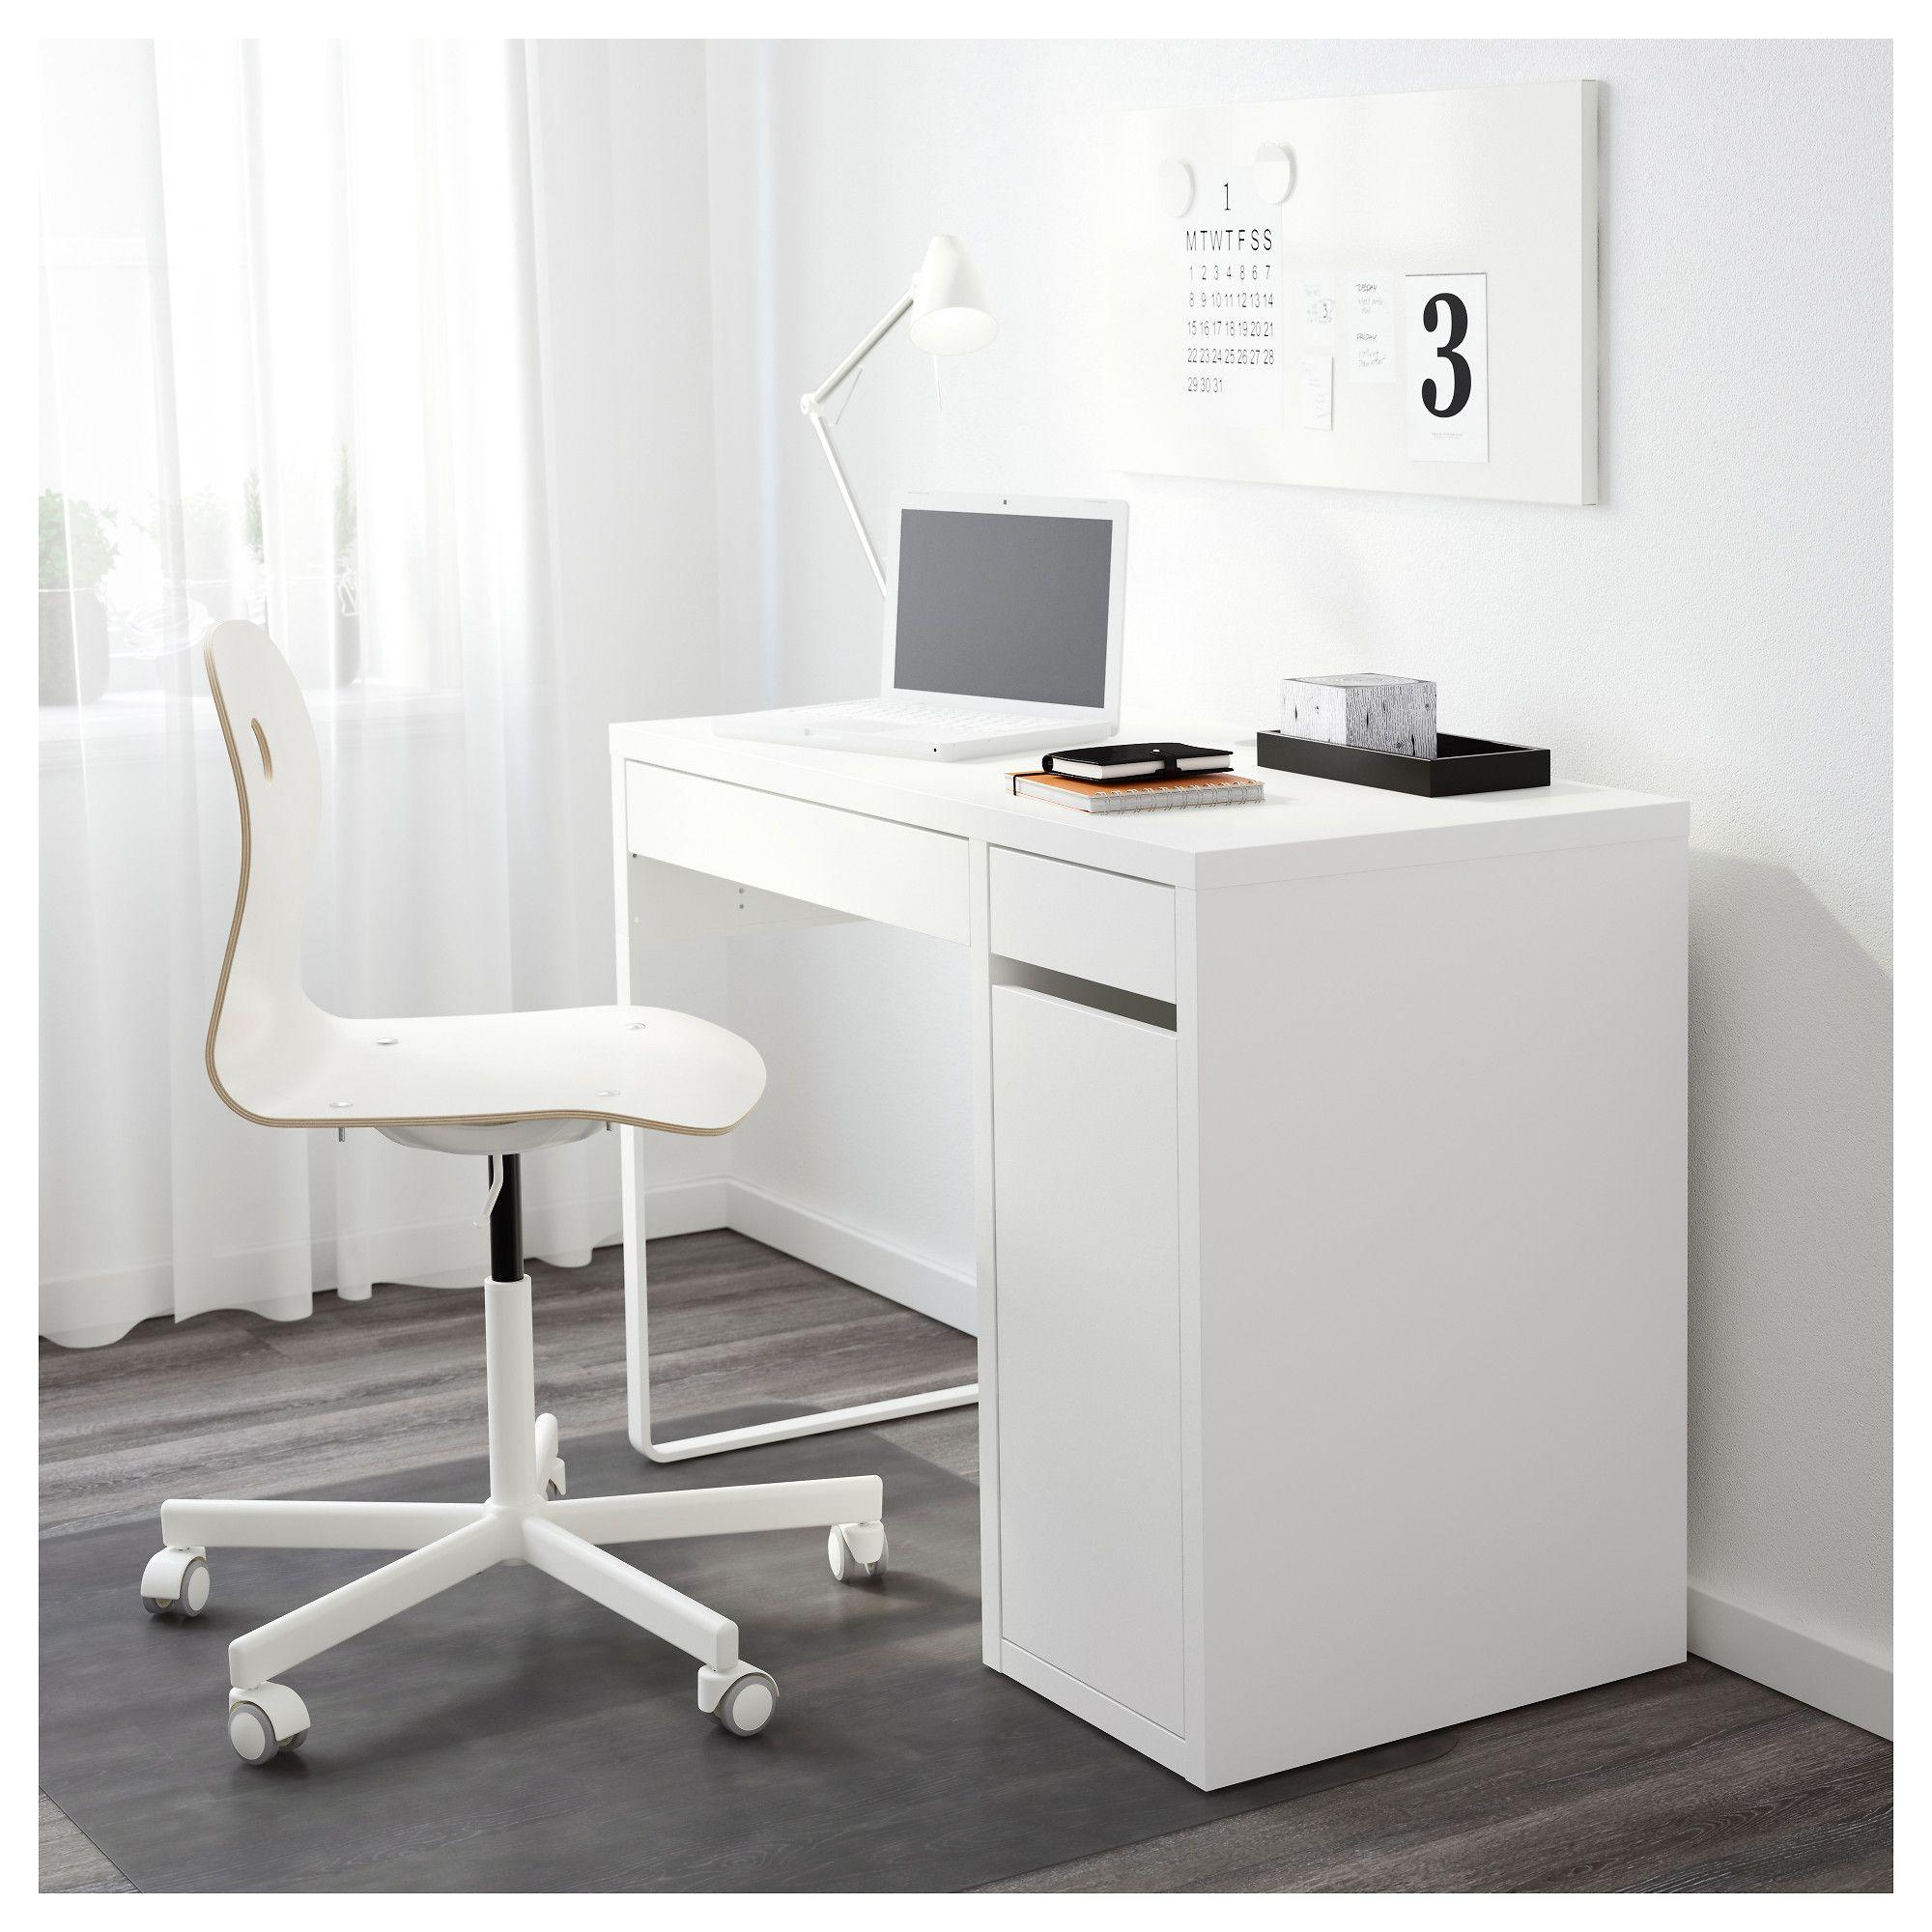 IKEA MICKE Desk white Micke desk, White desks, Ikea micke